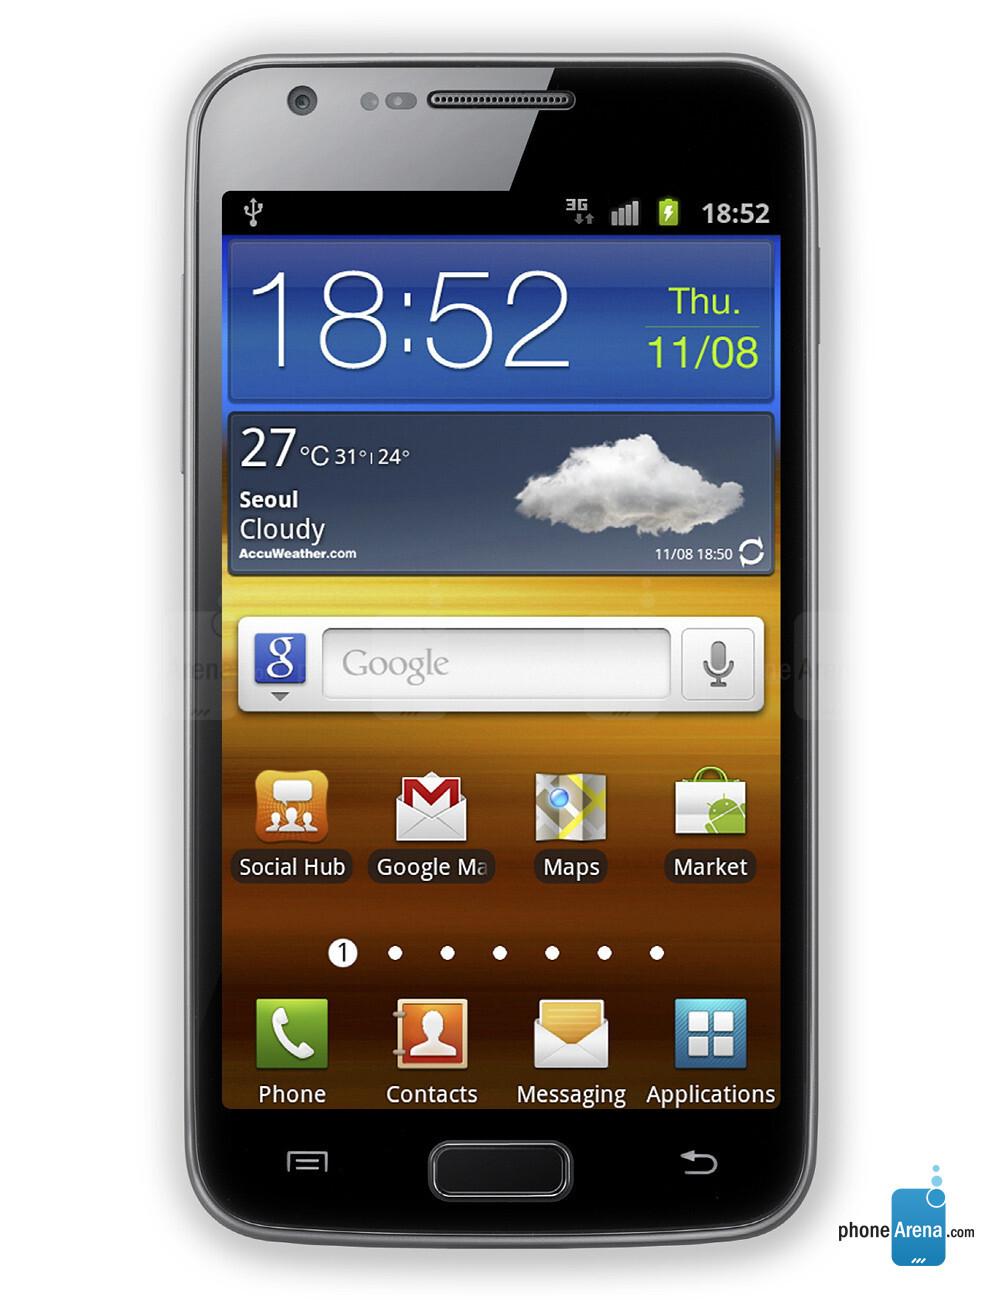 Cyber Zone: Samsung Galaxy S2 (SHV-E110s) Flash to Stock Rom